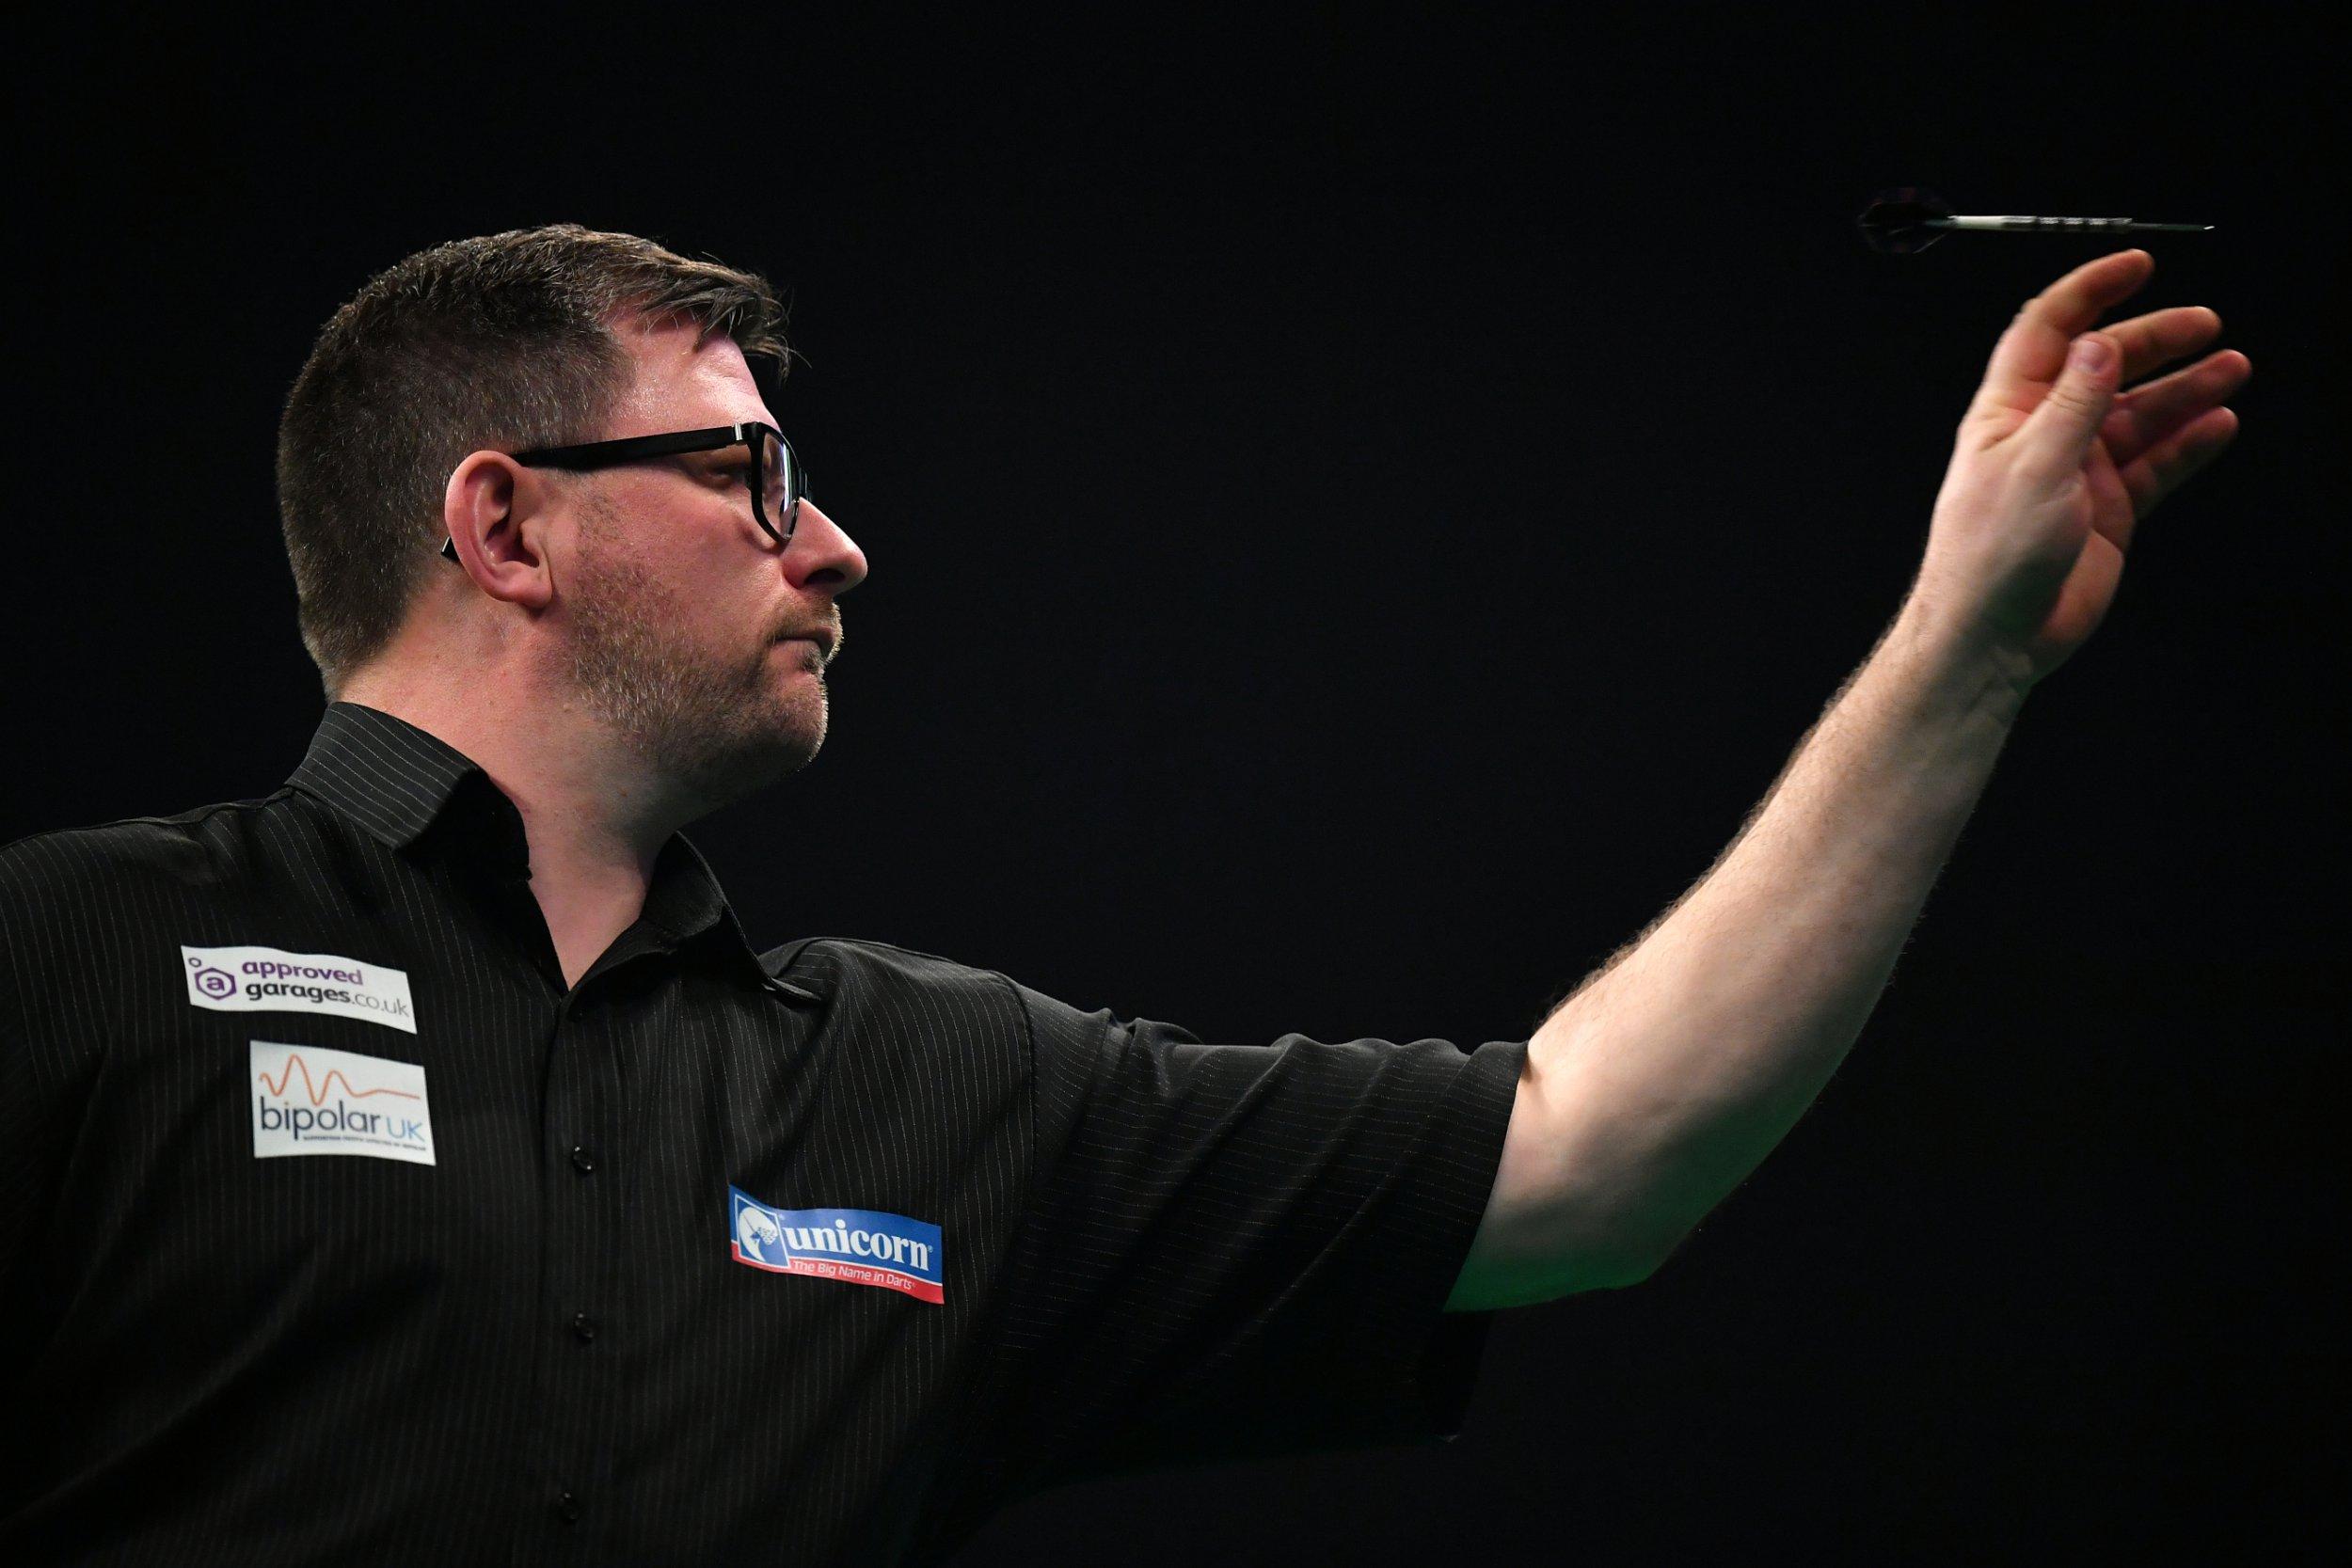 Premier League Darts Week 5 fixtures, odds, table and meet latest contender John Henderson